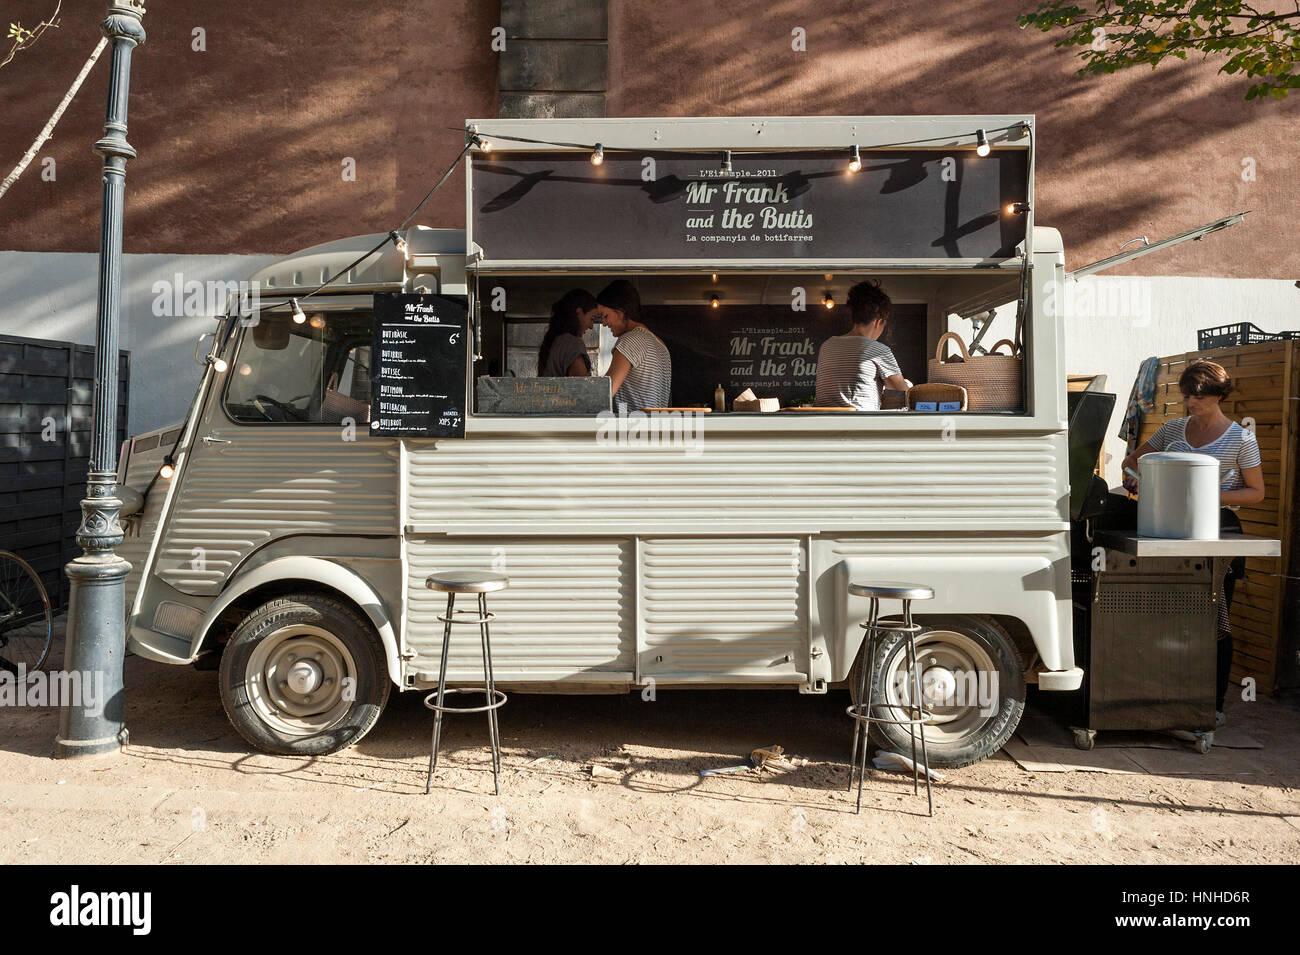 Food truck Mr. Frank and the Butis de Barcelona, Catalonia. - Stock Image